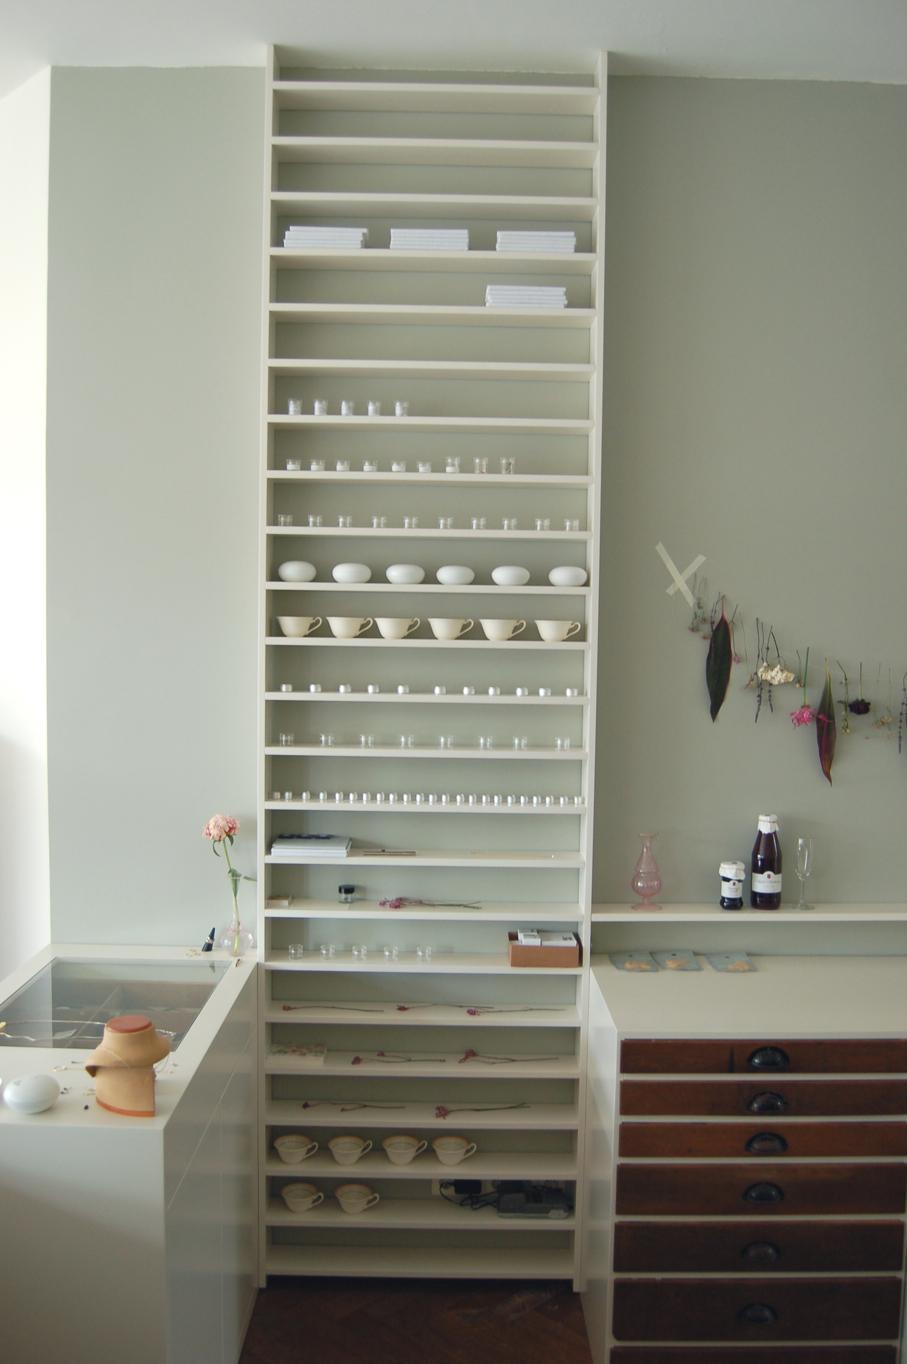 charlotte_wooning_everydaybeautiful_shop_interior_design_niels_van_hout_vervolmaken.06.jpg